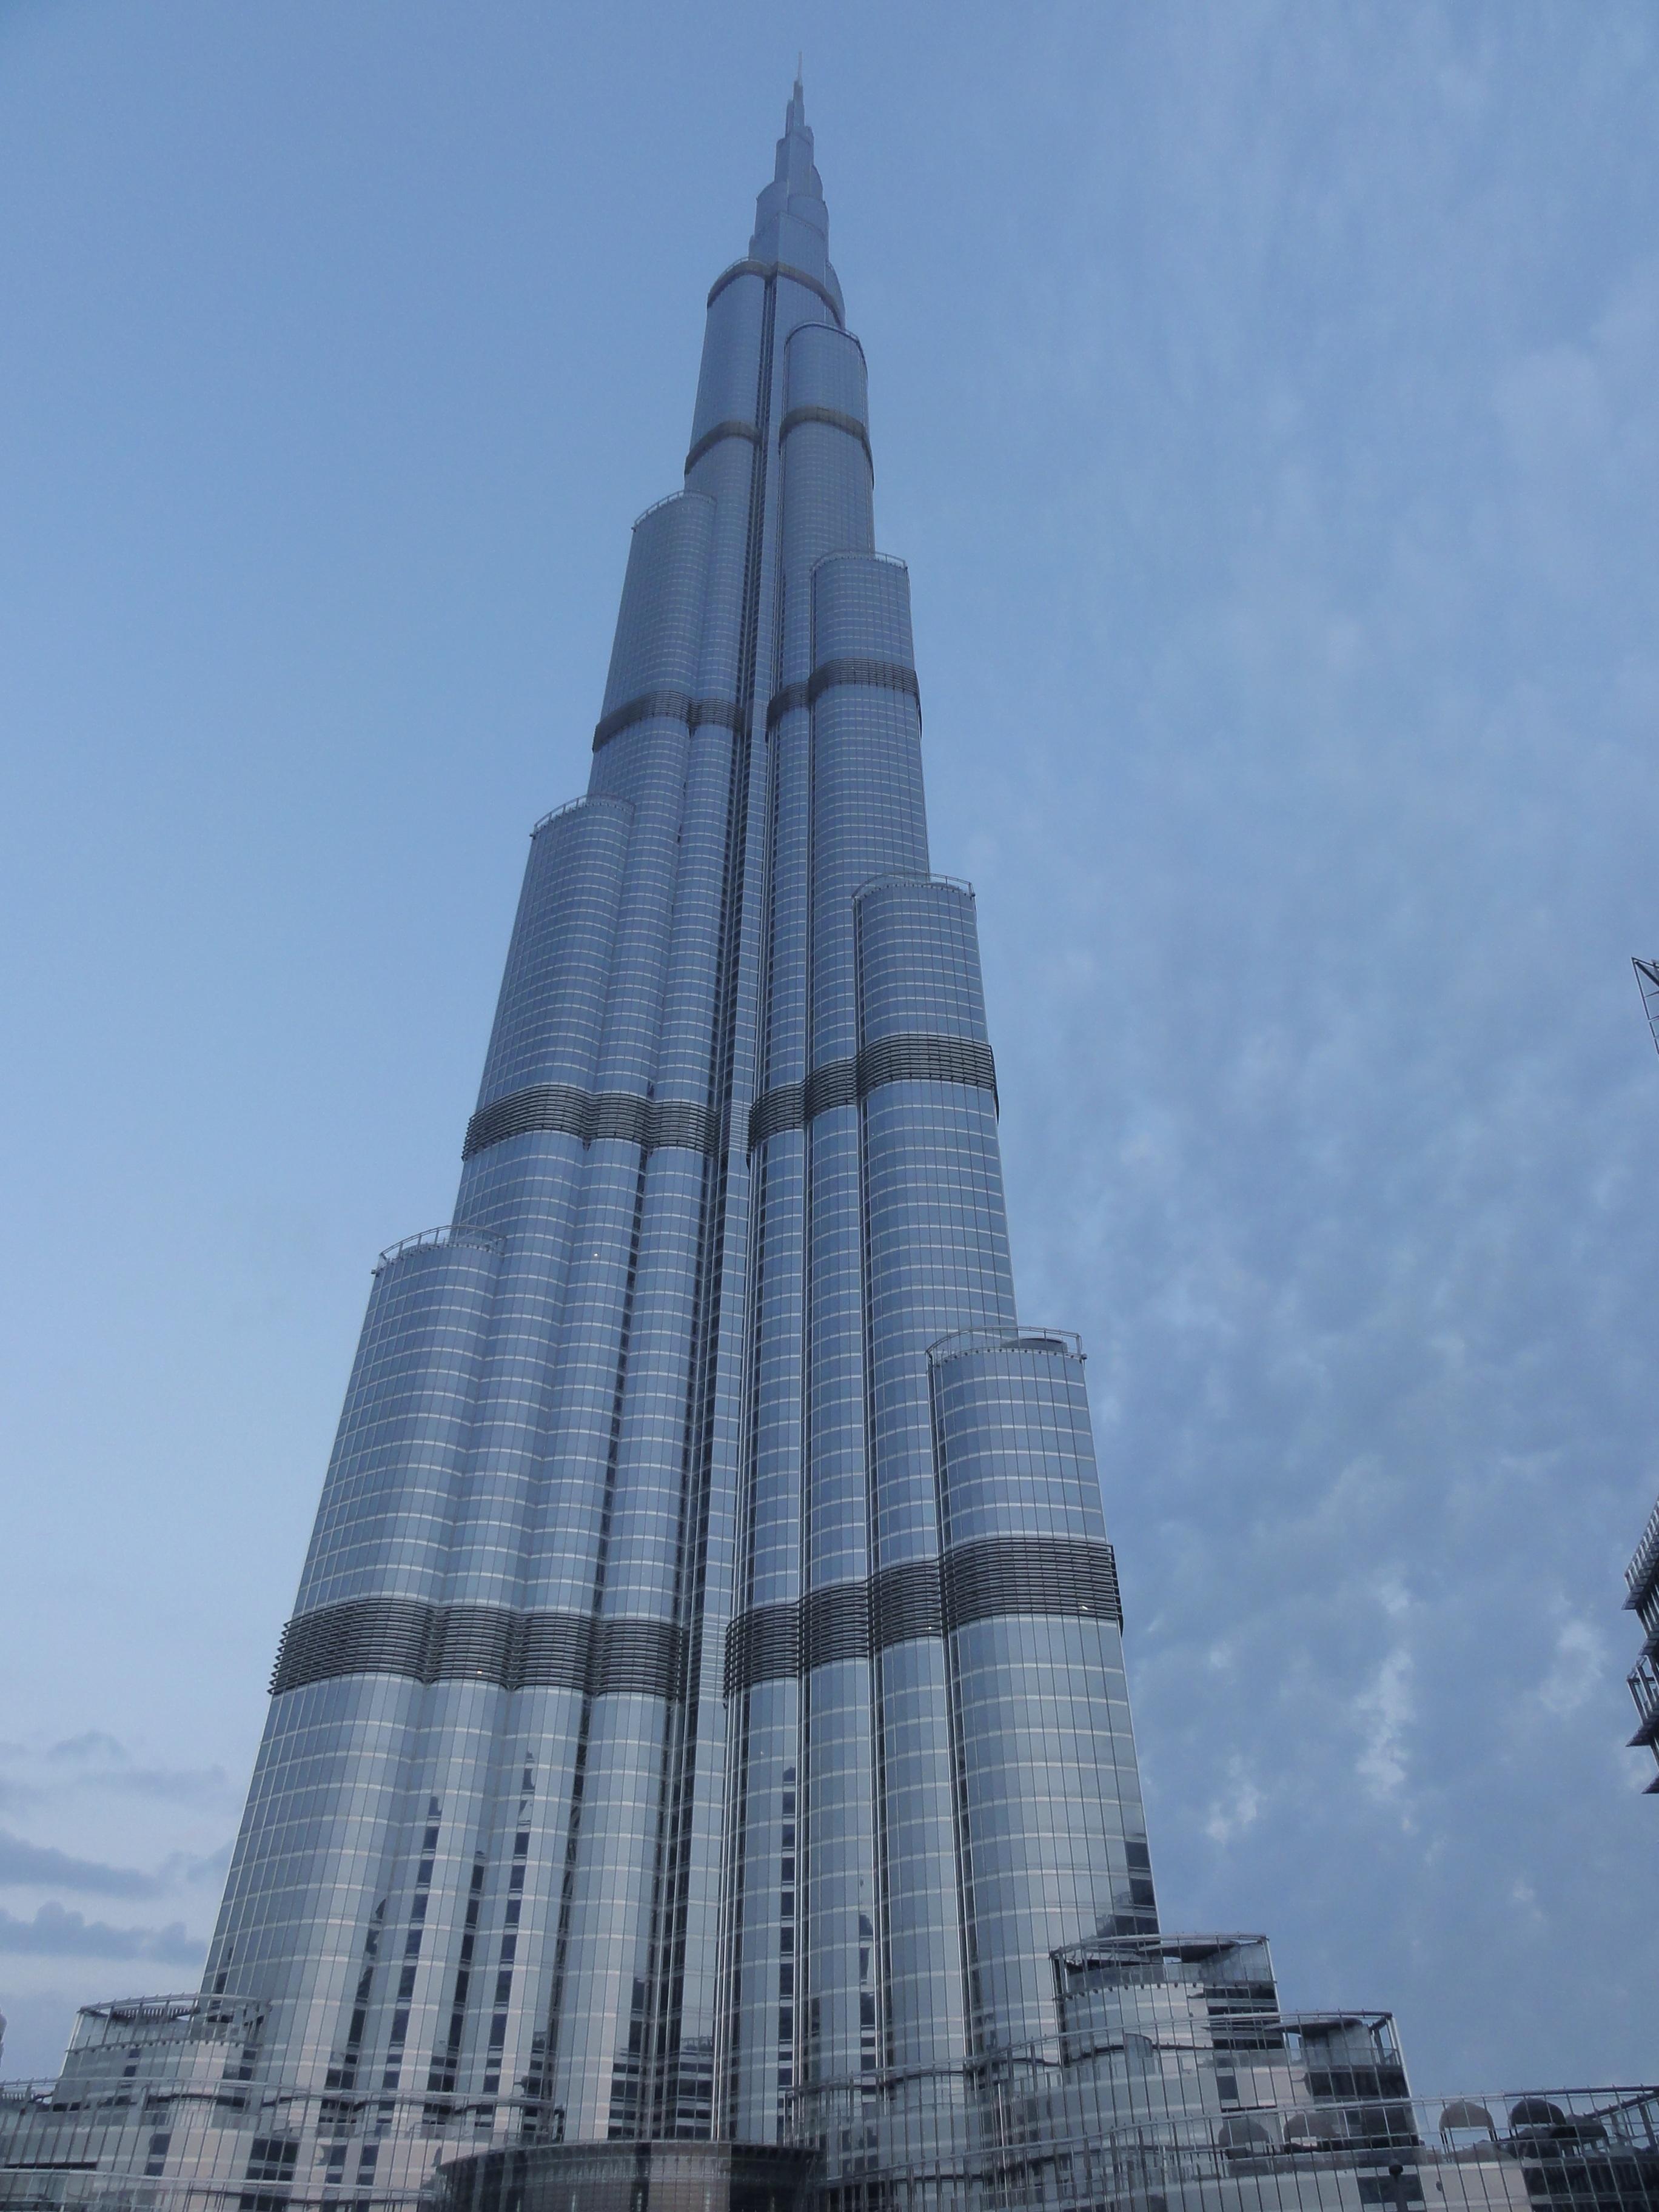 edificio rascacielos monumento torre dubai punto de referencia bloque de pisos aguja campanario uae emiratos